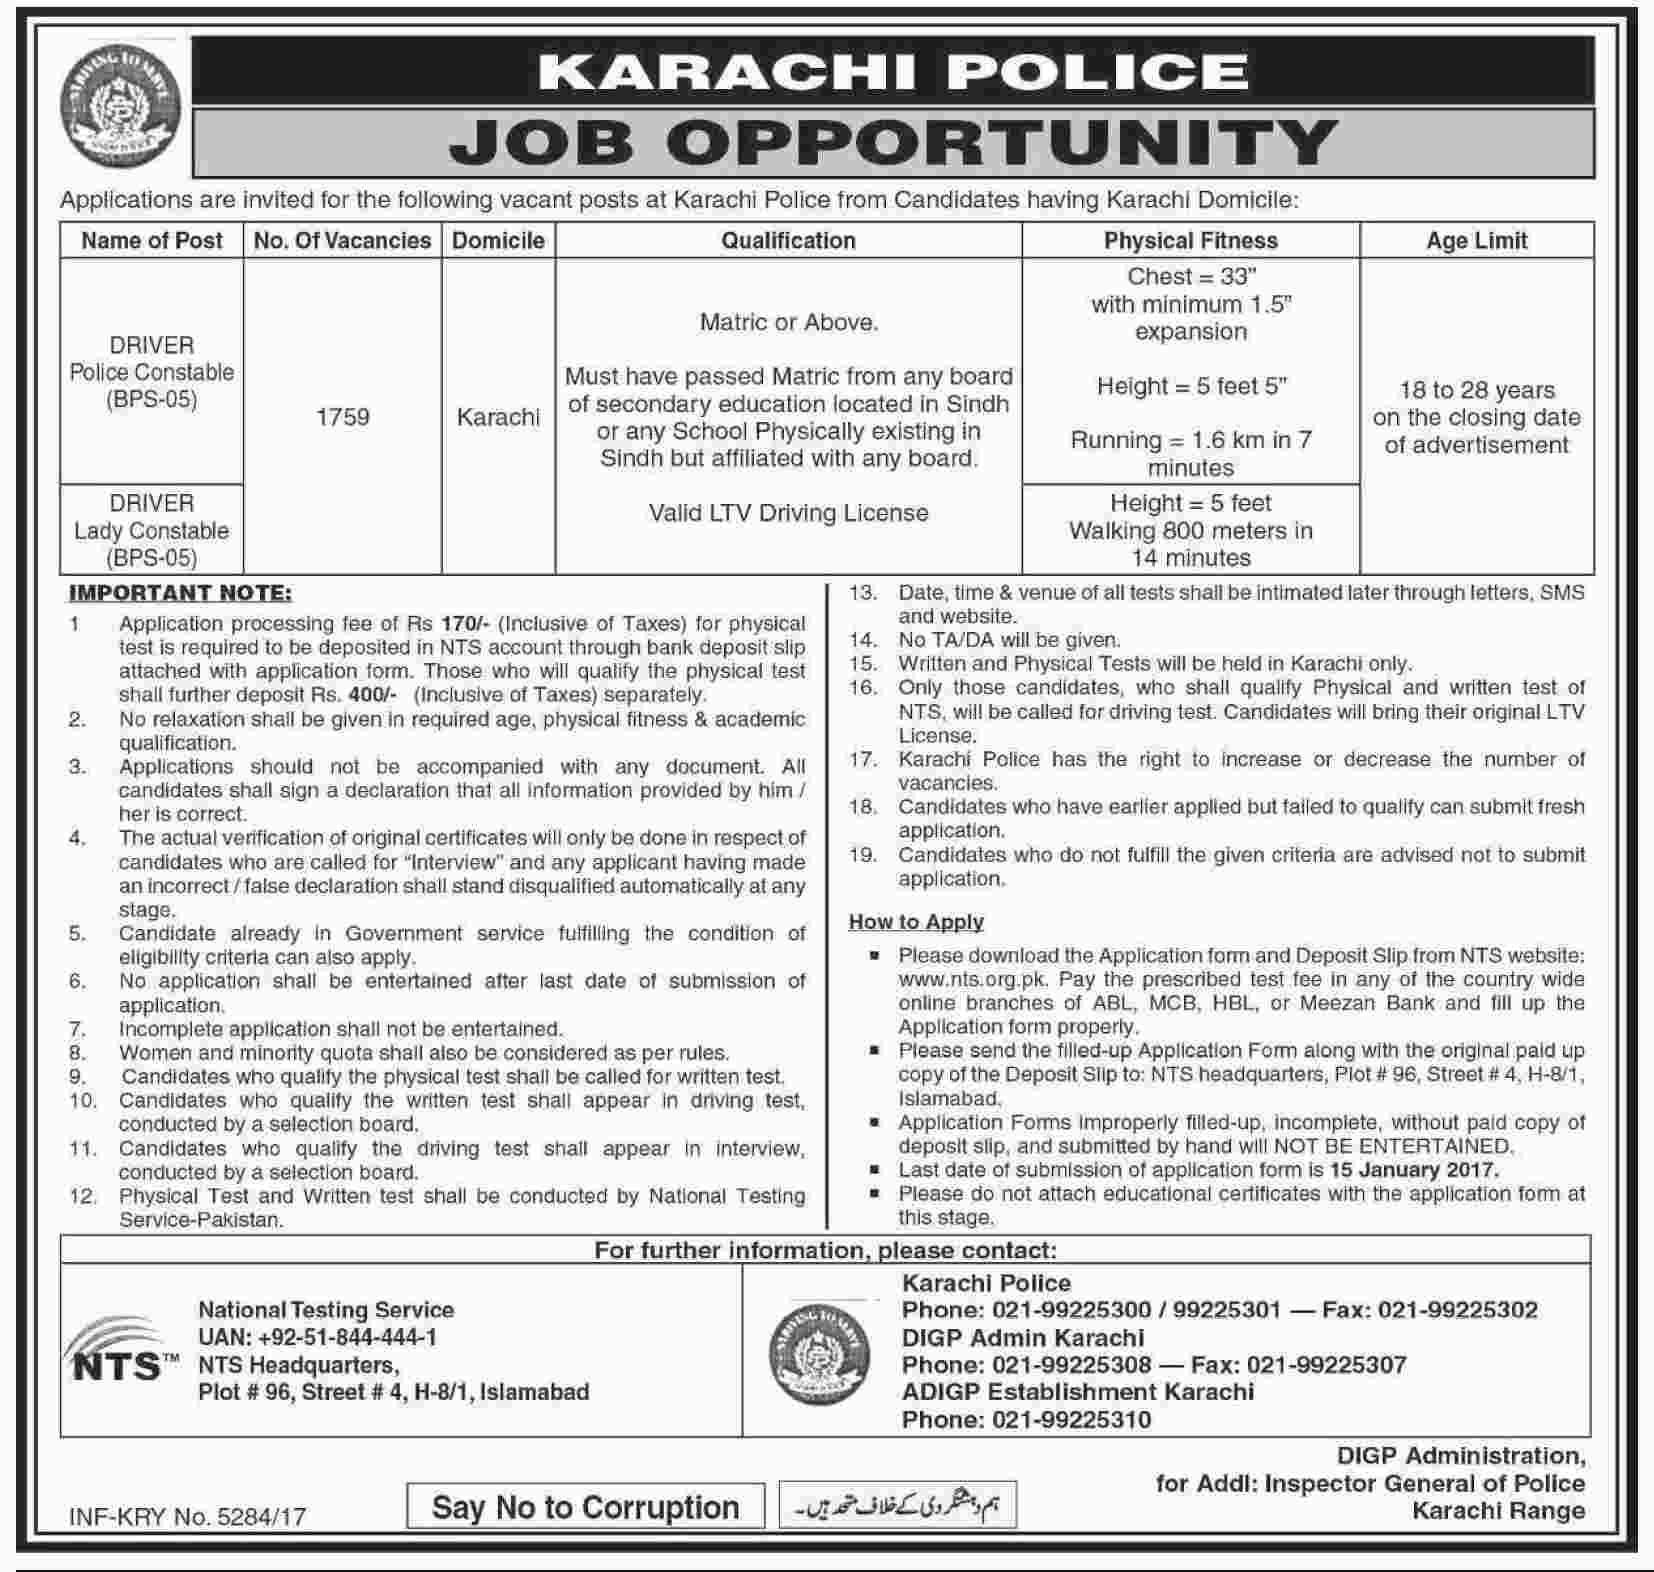 Karachi Police Constables (Drivers) 1759 Jobs Dawn Newspaper 21 December 2017